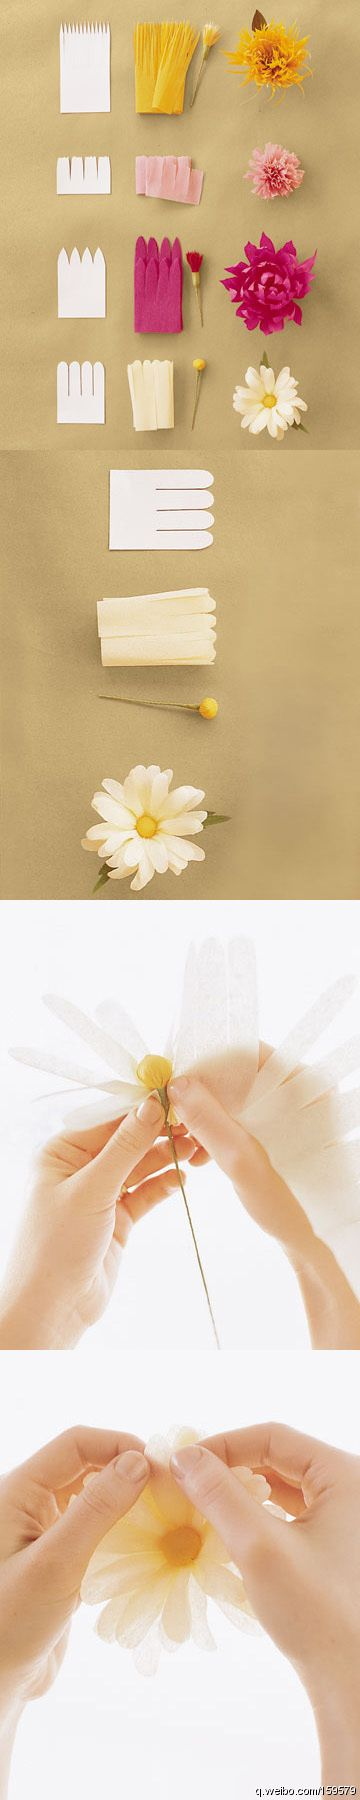 fake flowers #DIY ooooh I love these!!:)